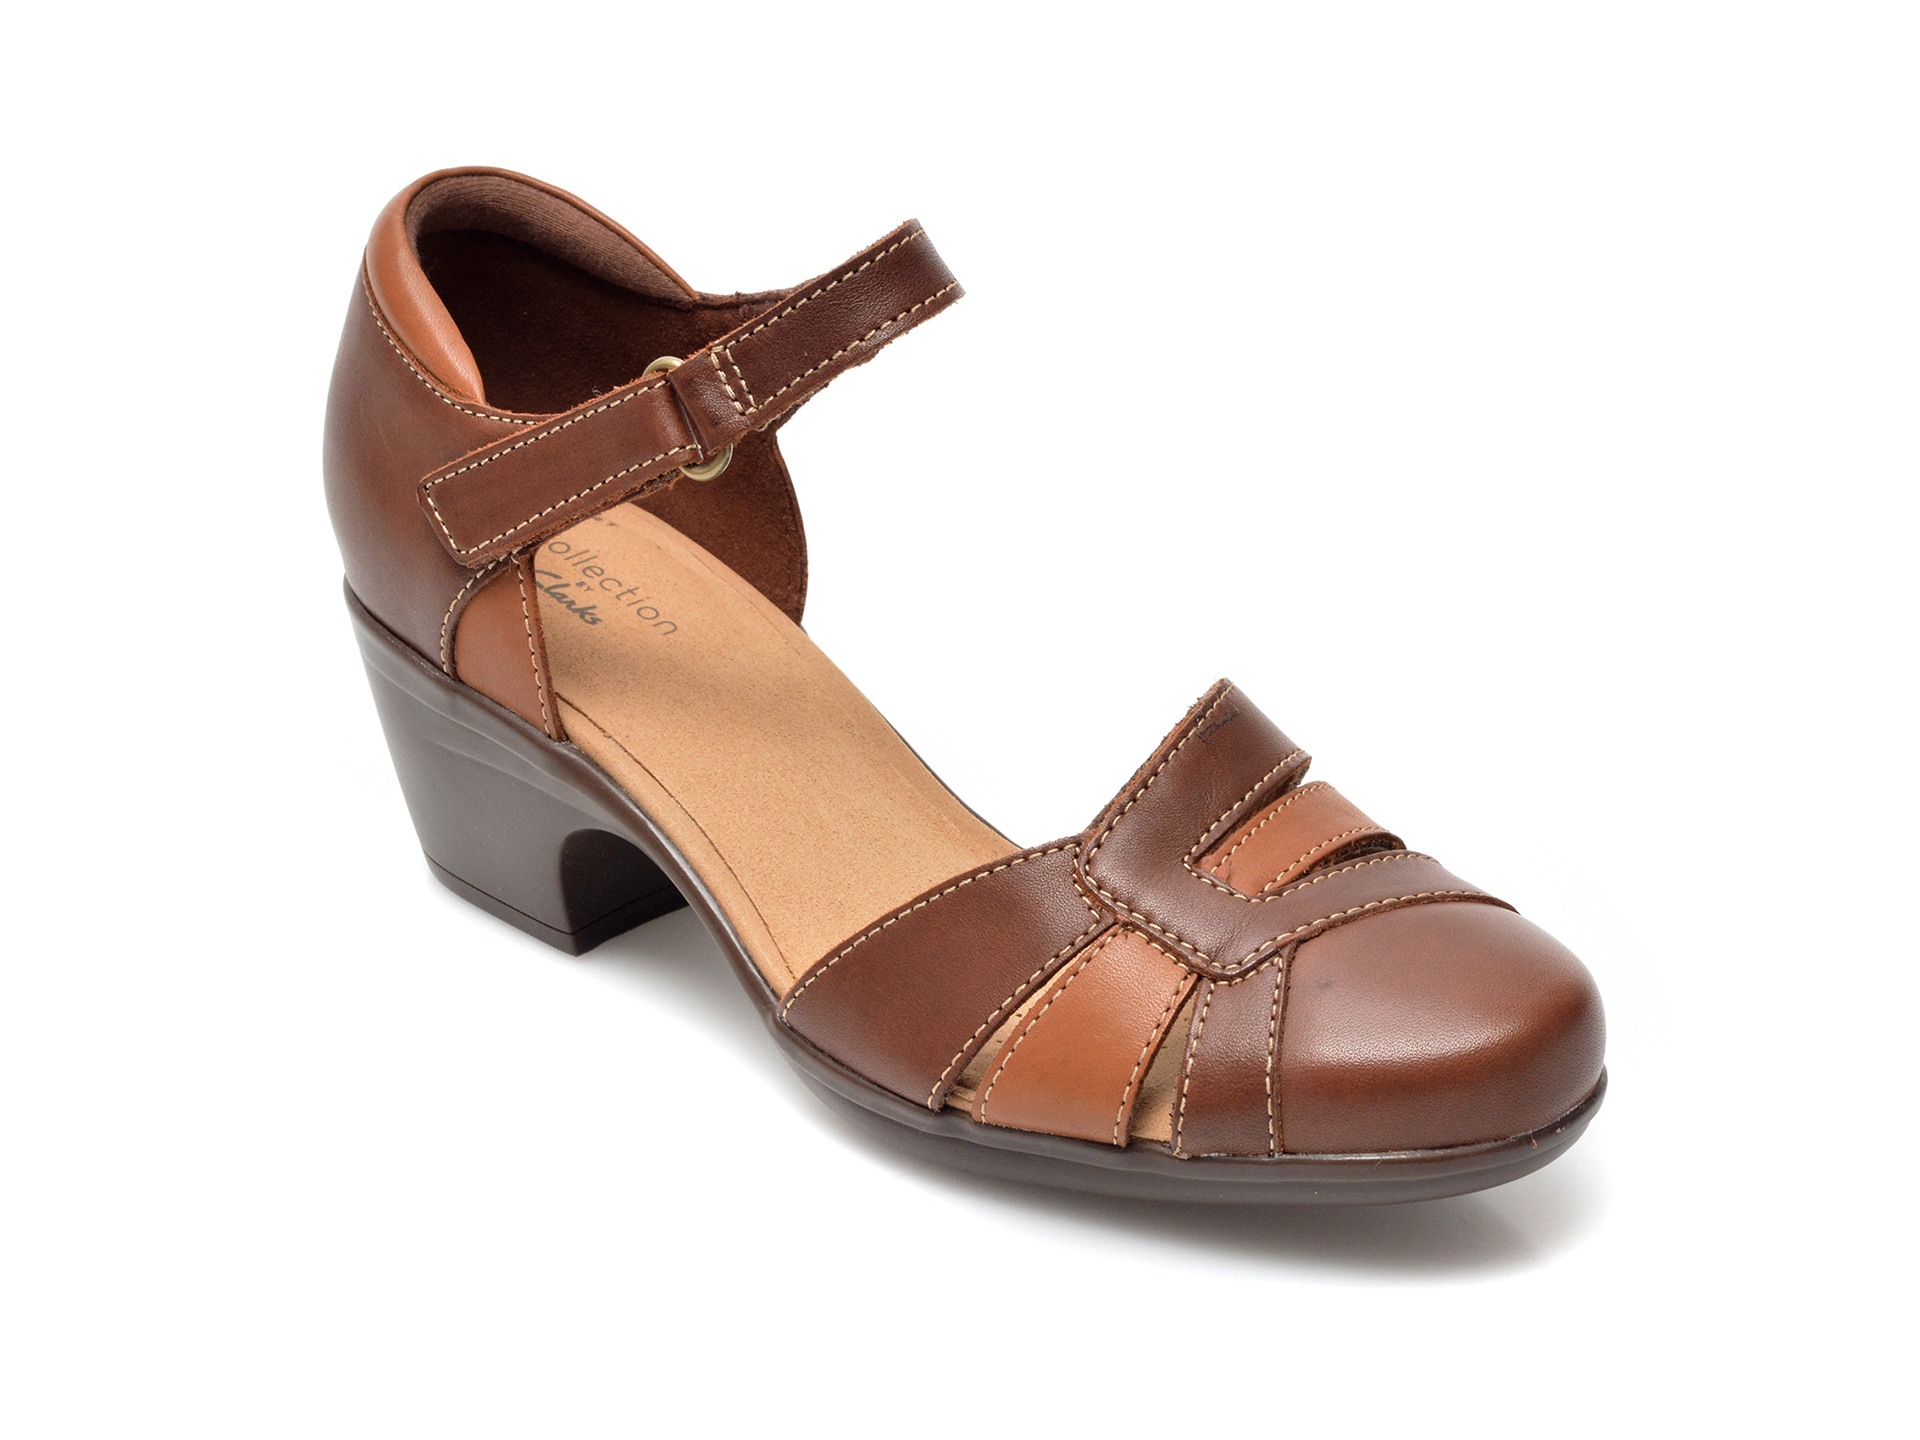 Sandale CLARKS maro, Emily Daisy, din piele naturala imagine otter.ro 2021